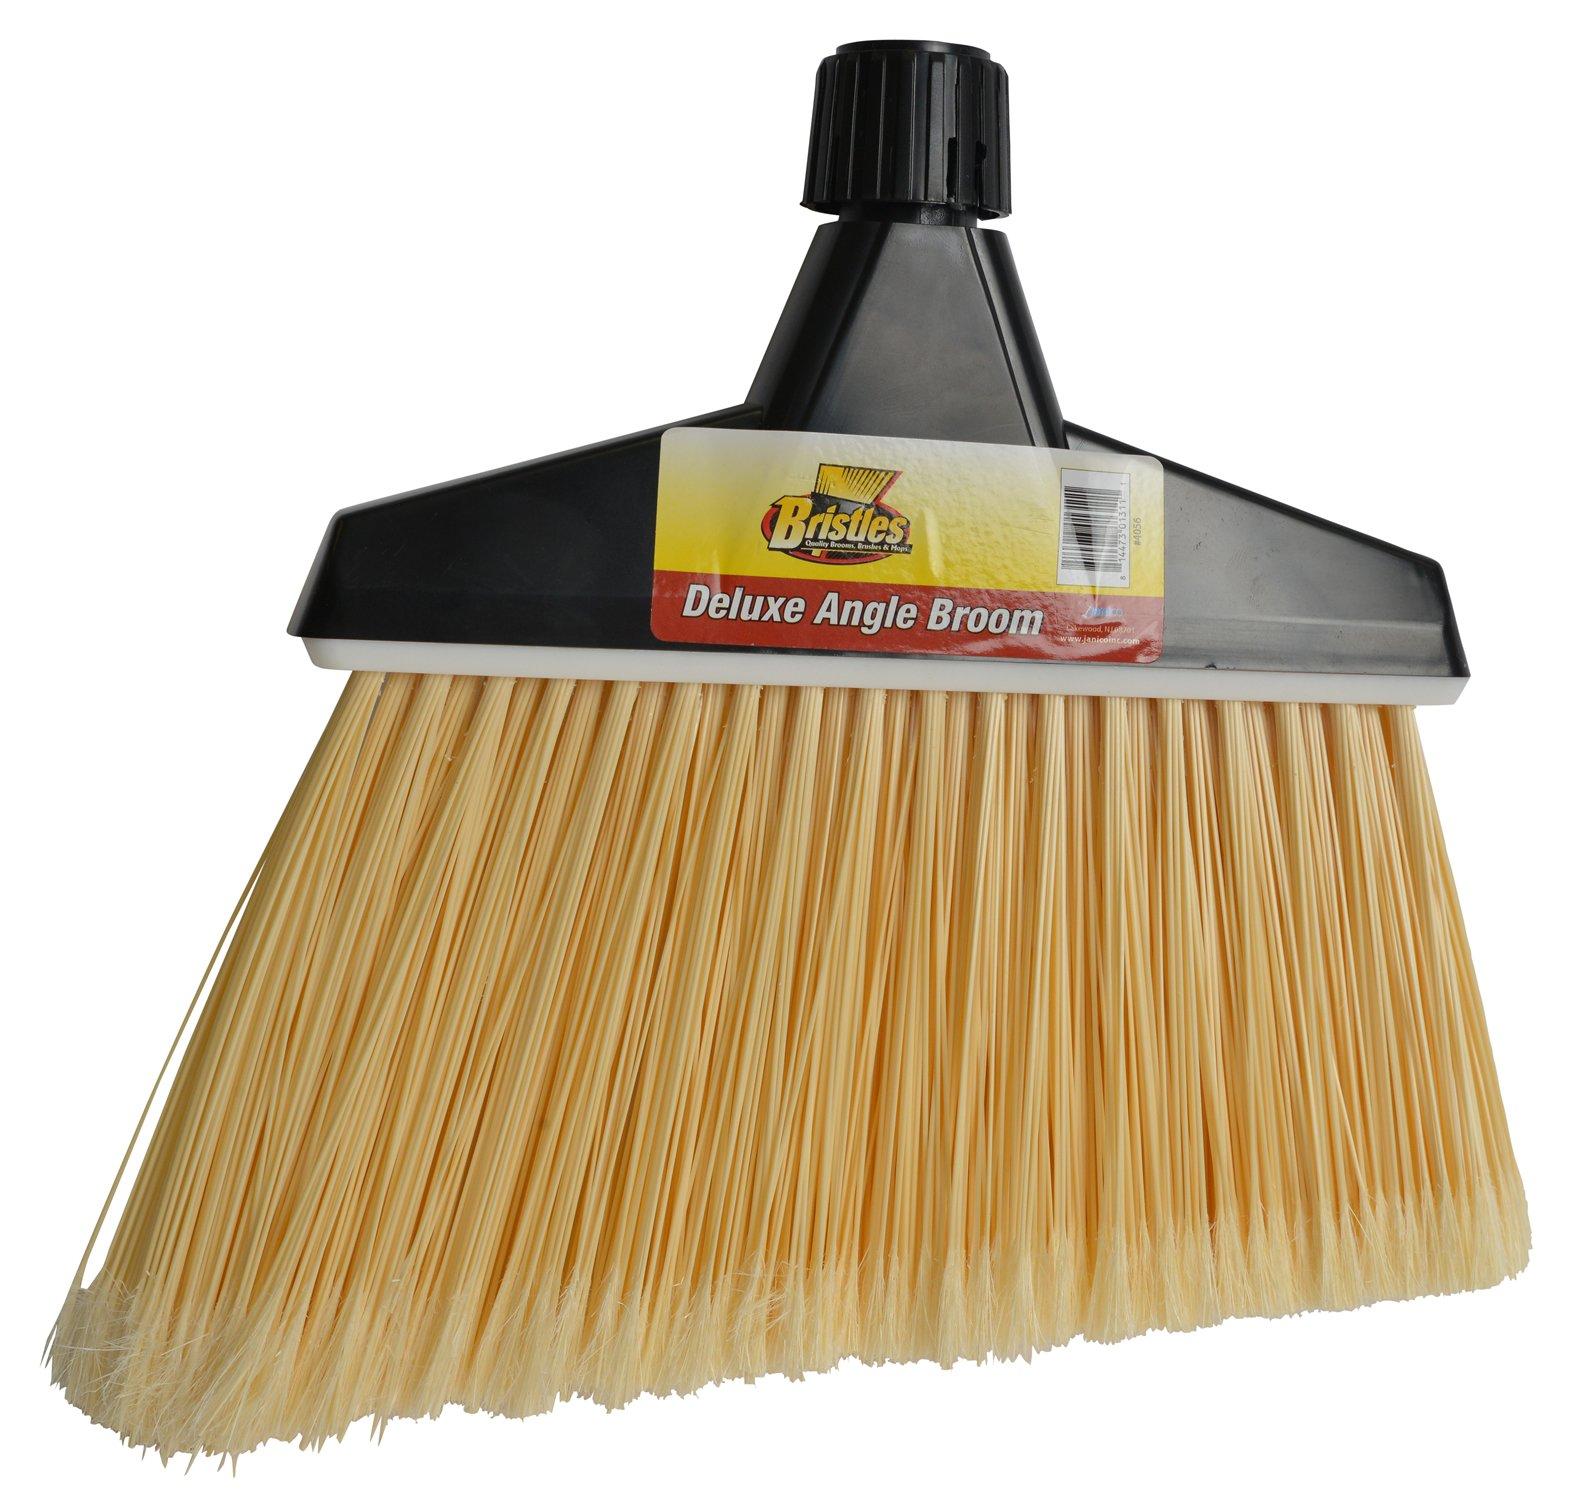 Janico 4056 Bristles Angle Broom, Flagged Bristles, Screw Clamp Metal Handle, Natural